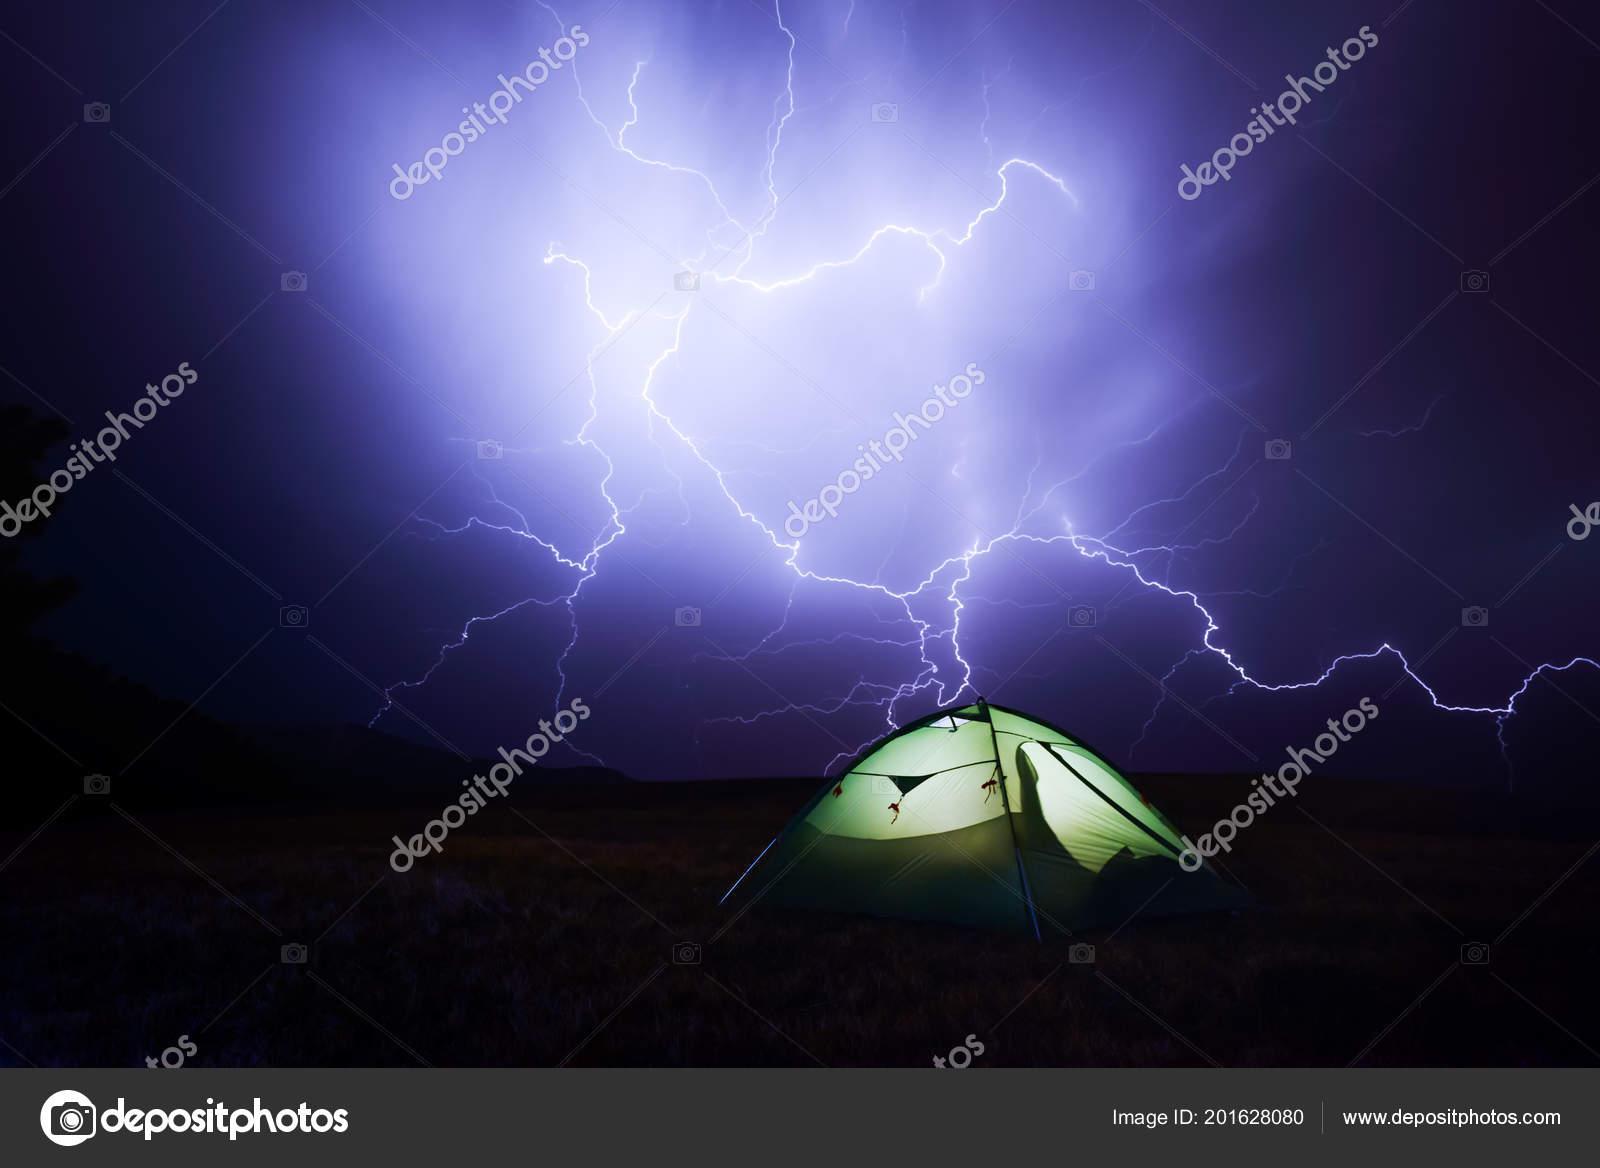 Incredible Sky Lightning Tent Camp Danger Tourism Concept